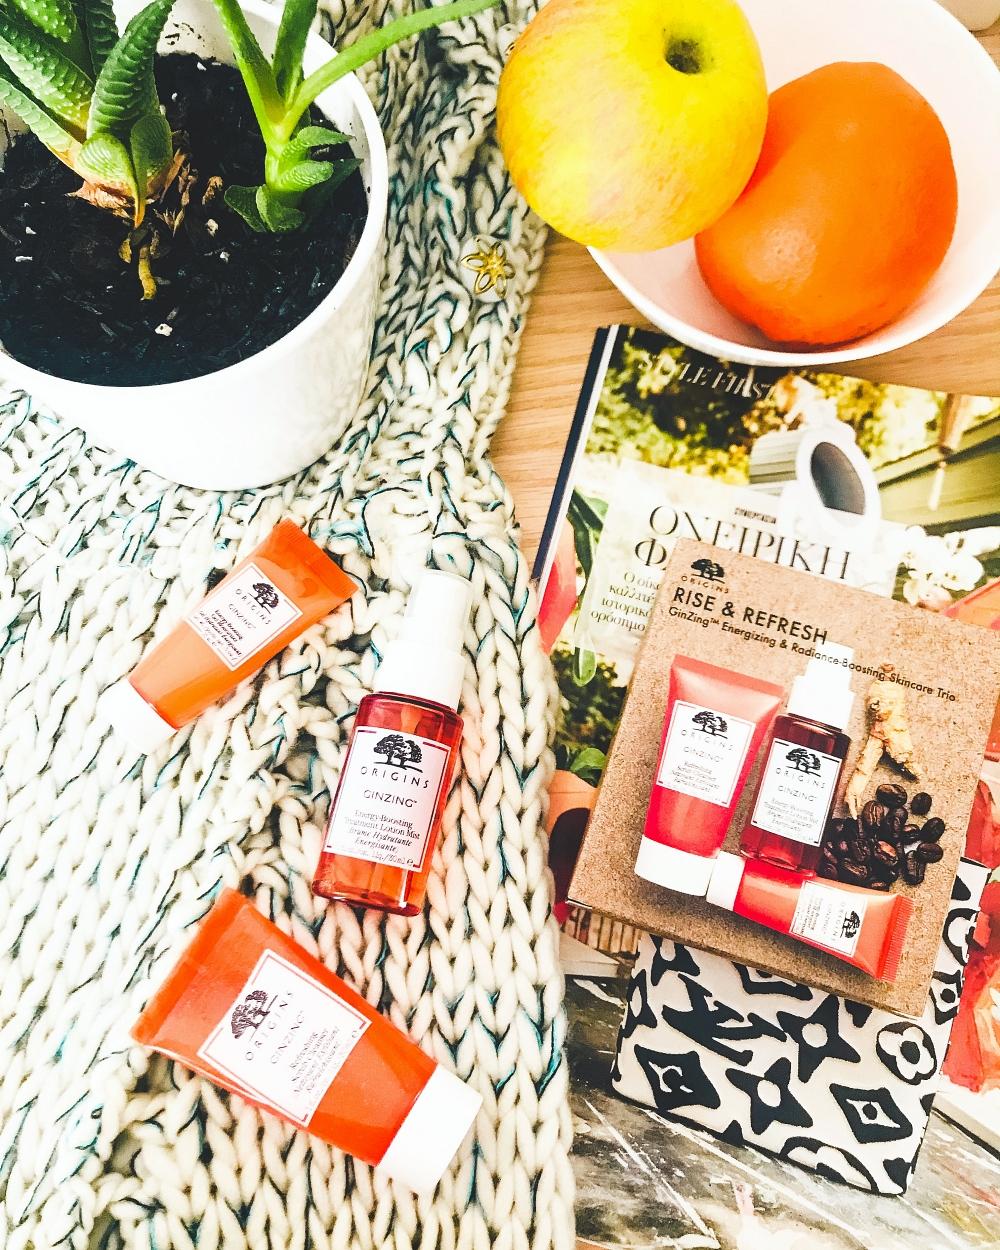 Origins Rise & Refresh Ginzing natural skincare travel set, vitamiin C skincare products